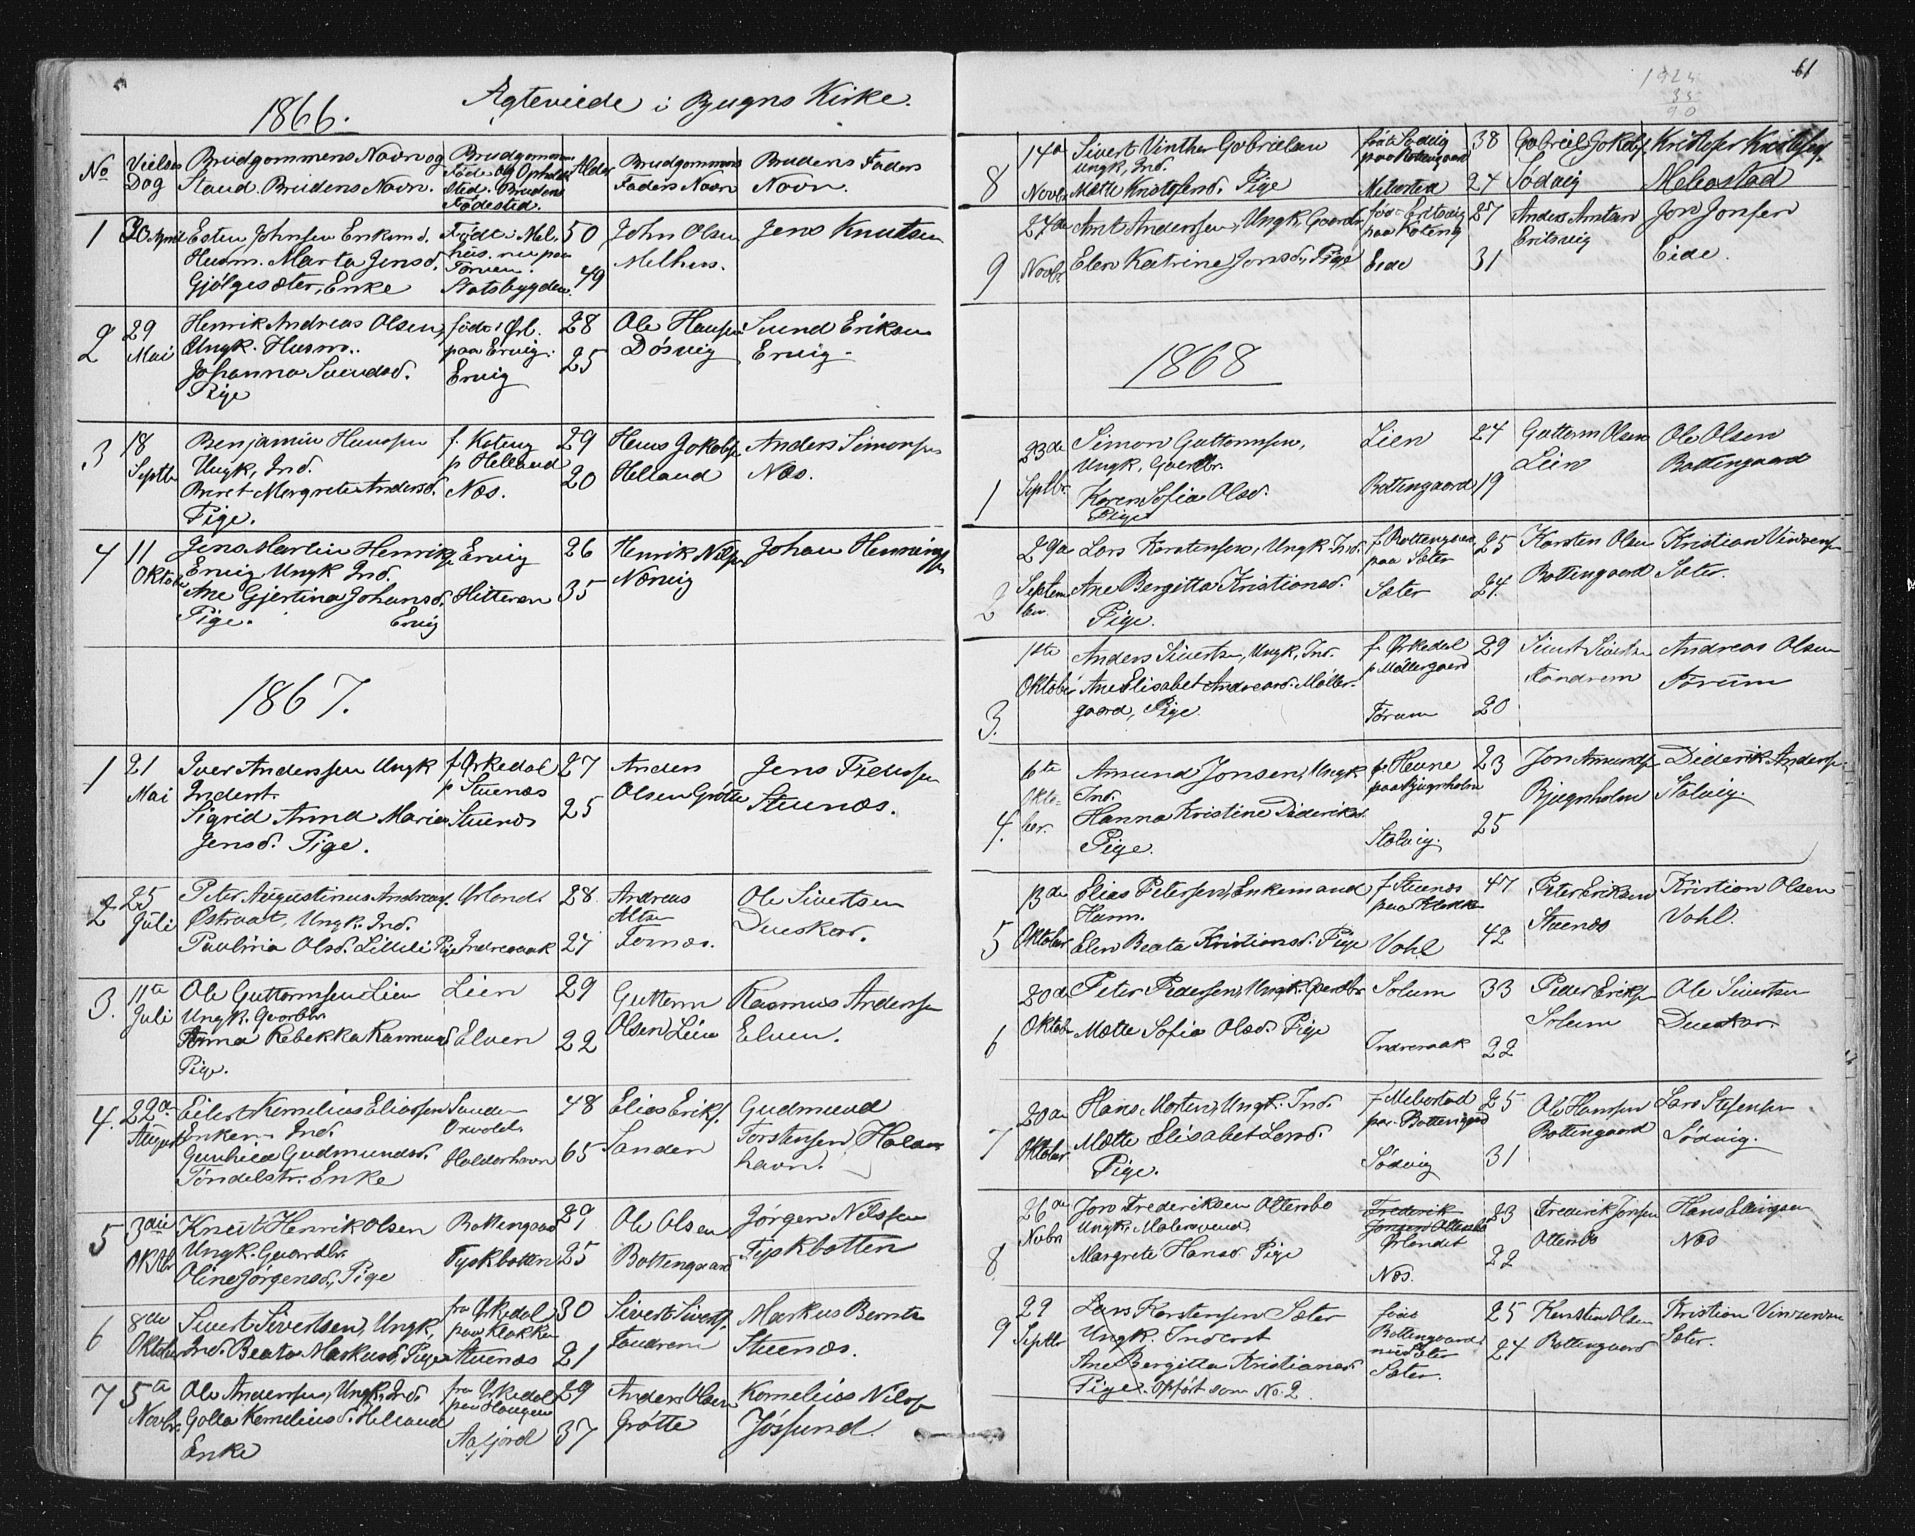 SAT, Ministerialprotokoller, klokkerbøker og fødselsregistre - Sør-Trøndelag, 651/L0647: Parish register (copy) no. 651C01, 1866-1914, p. 61